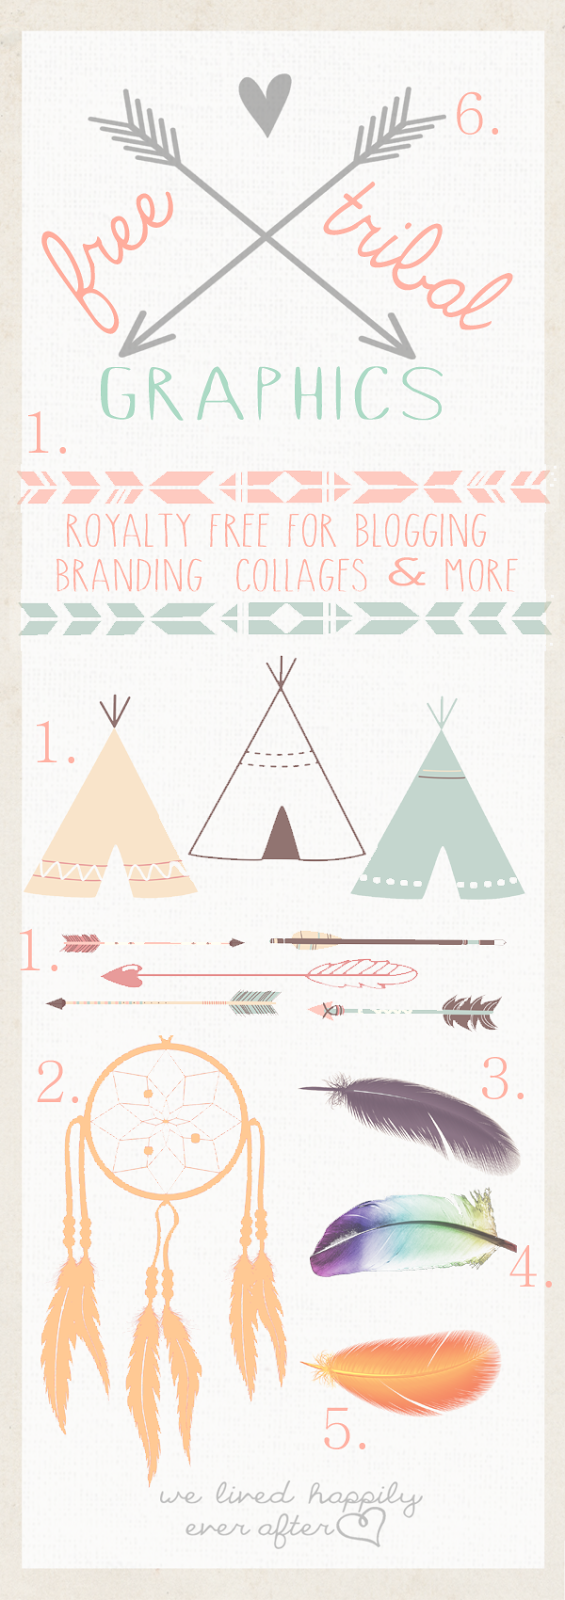 http://2.bp.blogspot.com/-SR4XLgN4br0/U3ufoHt0voI/AAAAAAAASWs/z2LG5dEOfuo/s1600/tribal+free+graphics.png